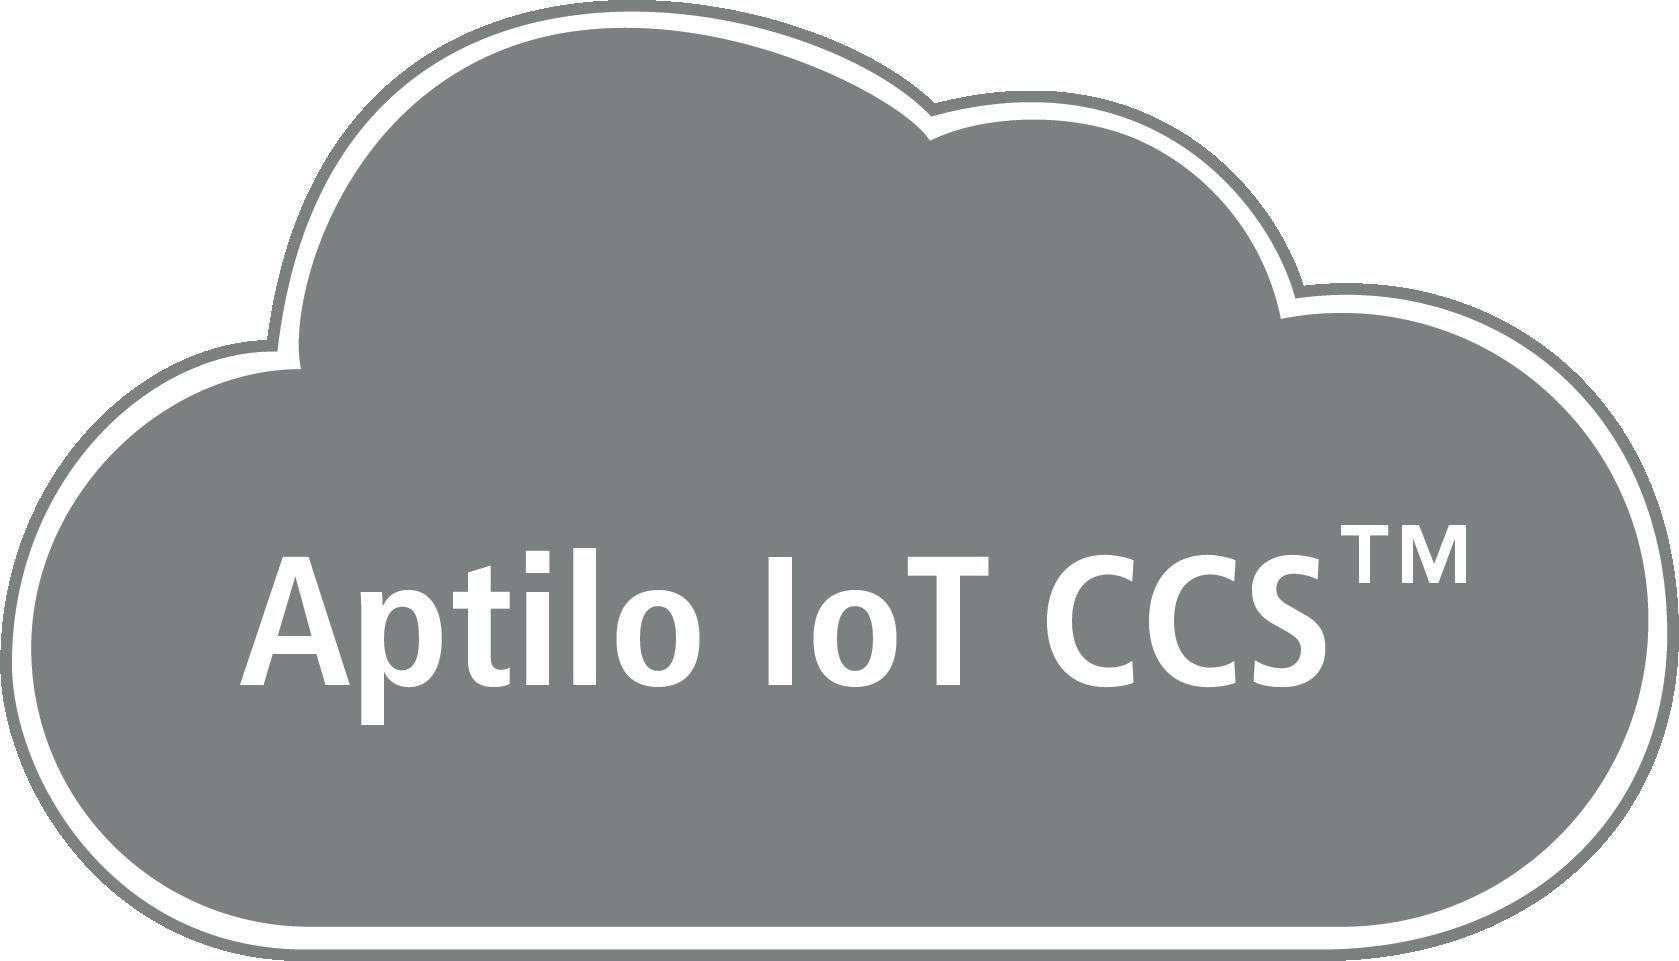 Aptilo IoT Connectivity Control Service™ (IoT CCS)